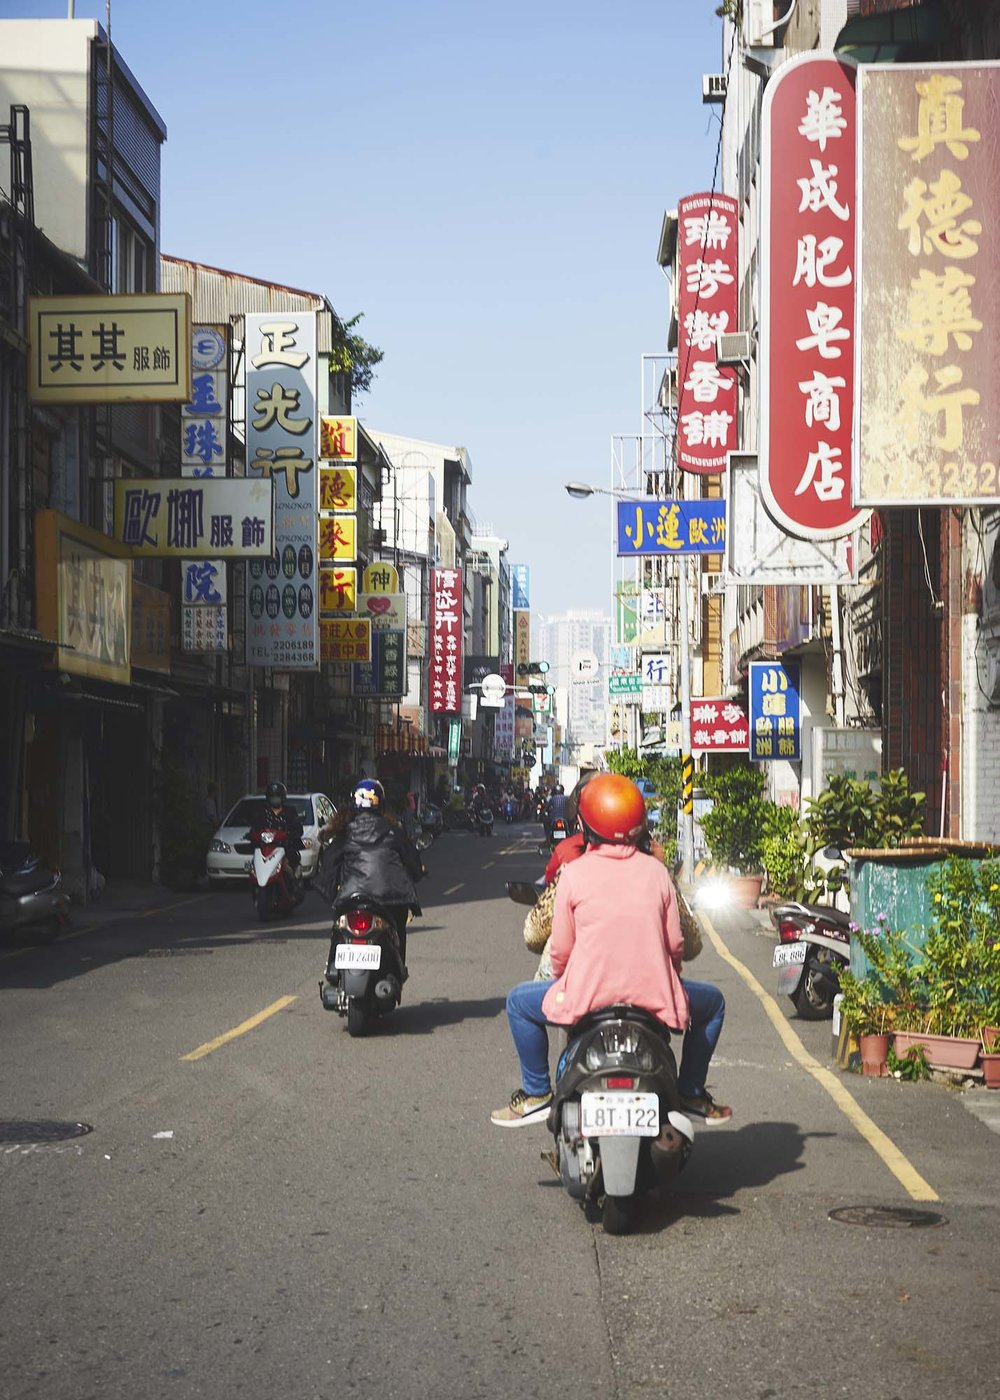 1711120 Taiwan 02409.jpg